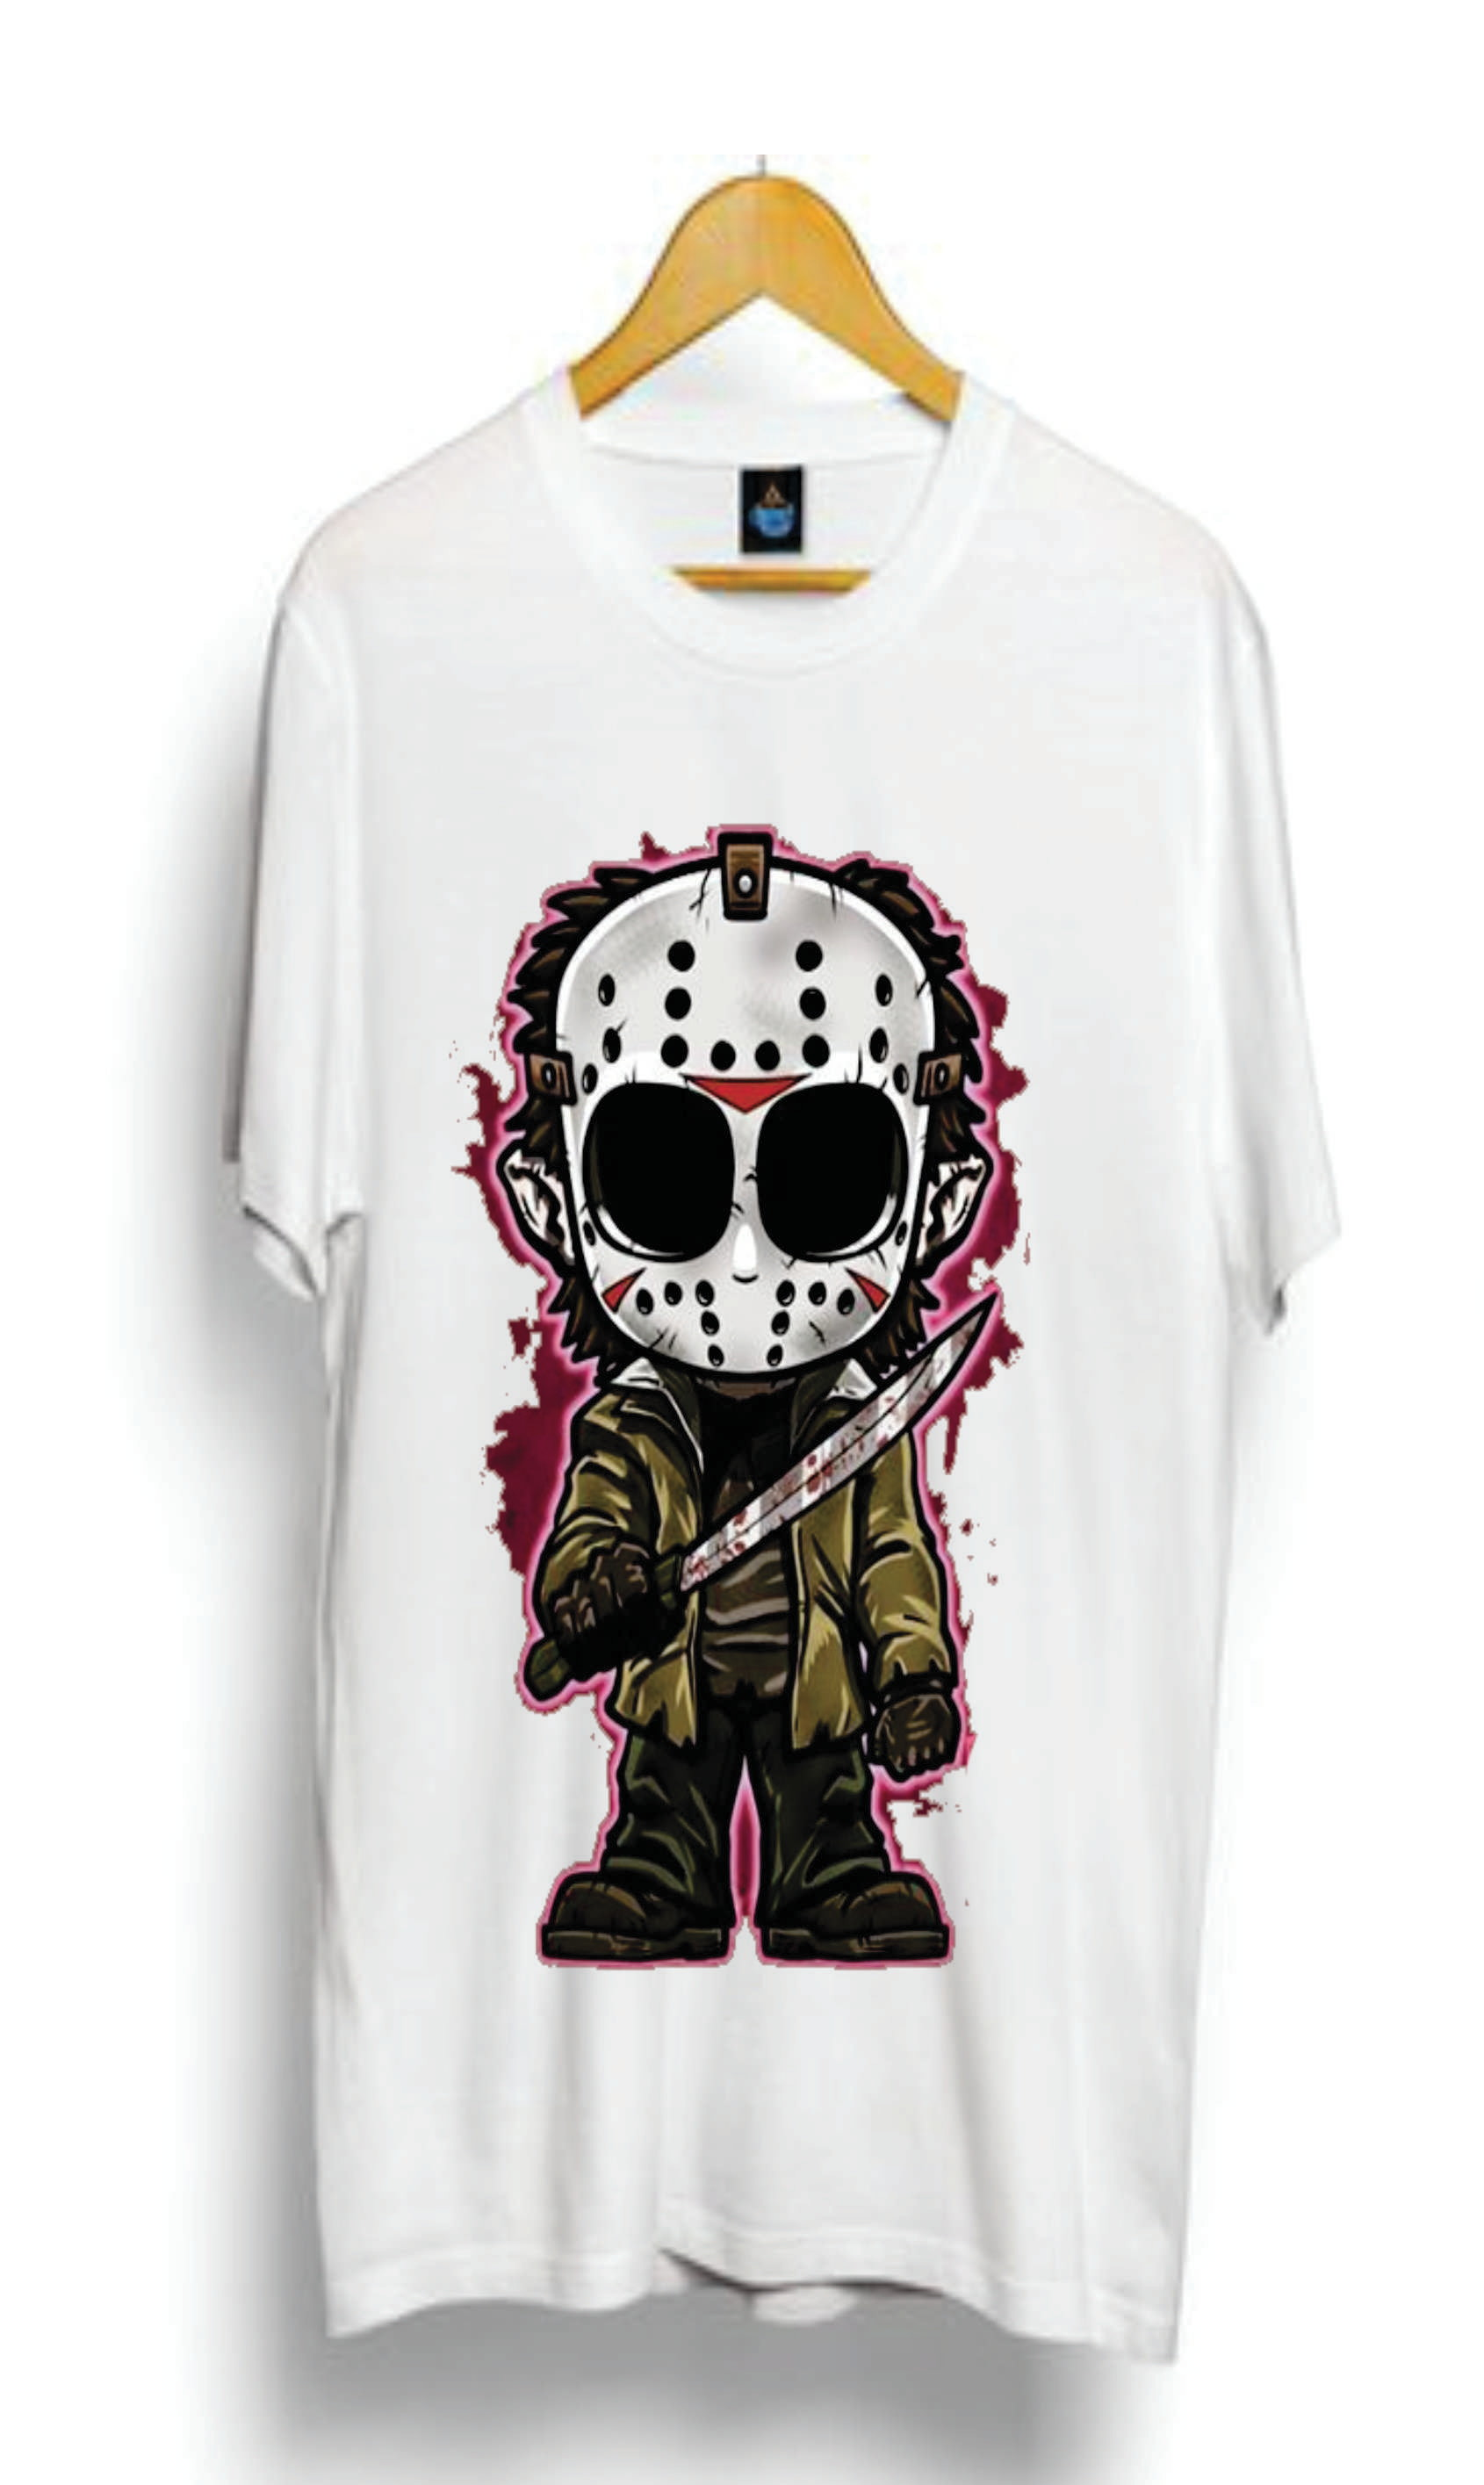 Camiseta Jason Sexta Feira 13 No Elo7 Ousadia 16 O16 E9e33c